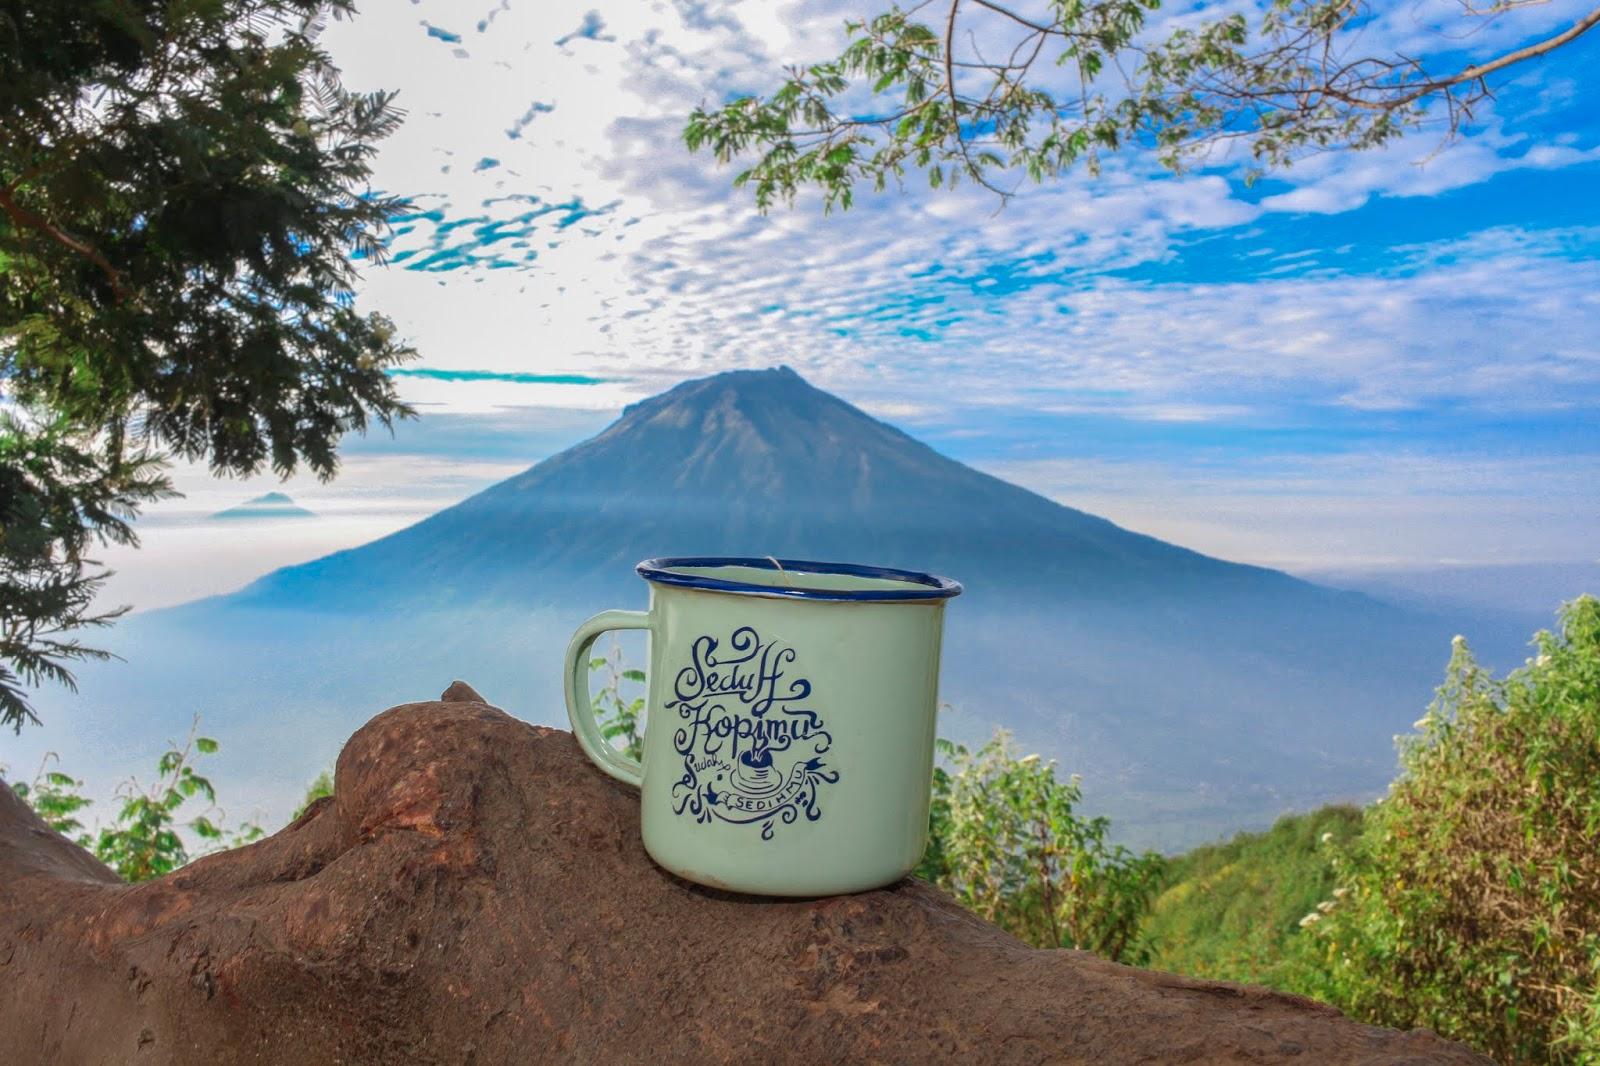 Pendakian Gunung Sindoro Via Kledung Sepasangcarrier